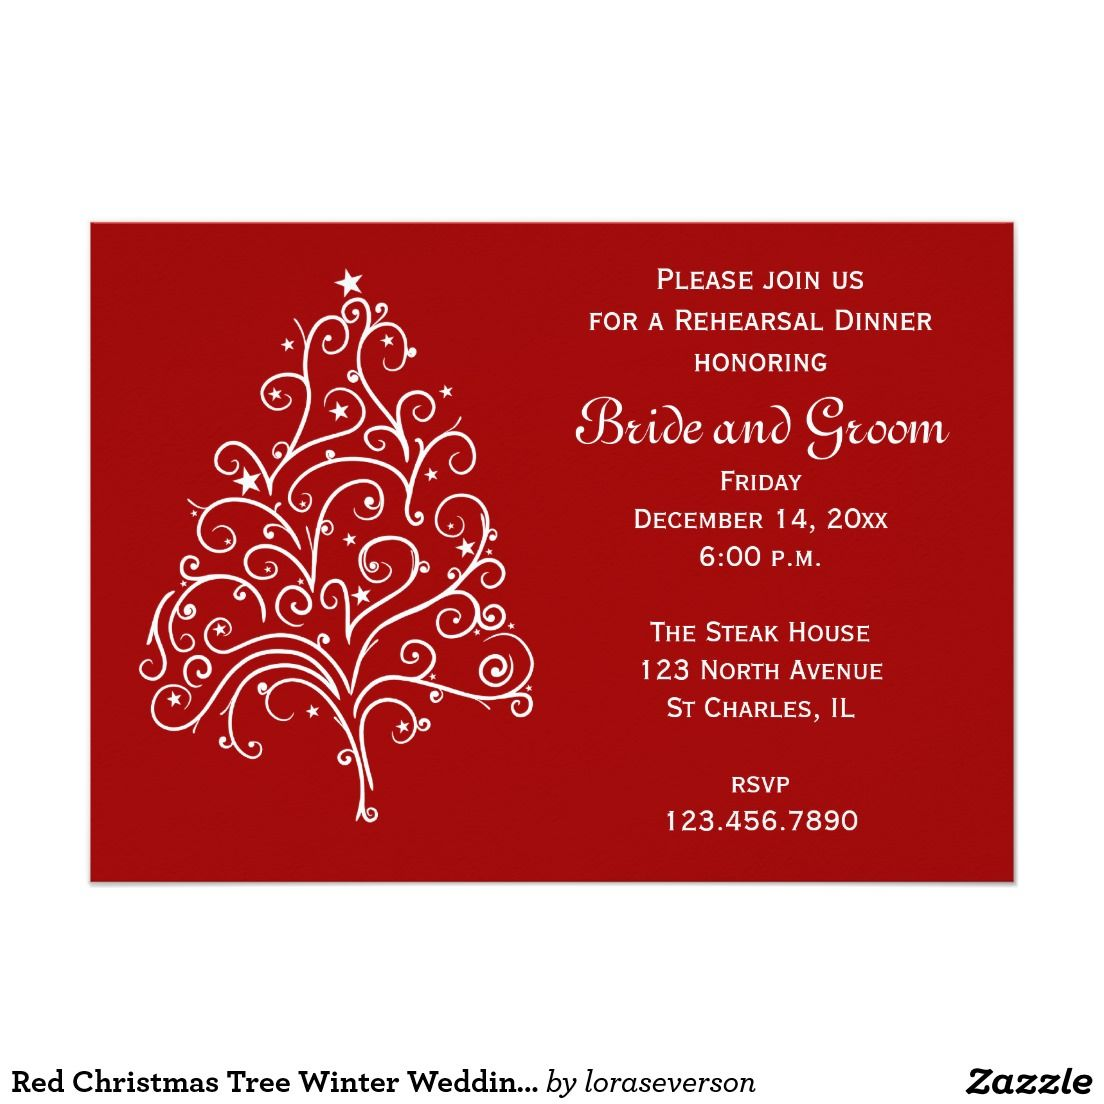 Red Christmas Tree Winter Wedding Rehearsal Dinner Card | Red christmas